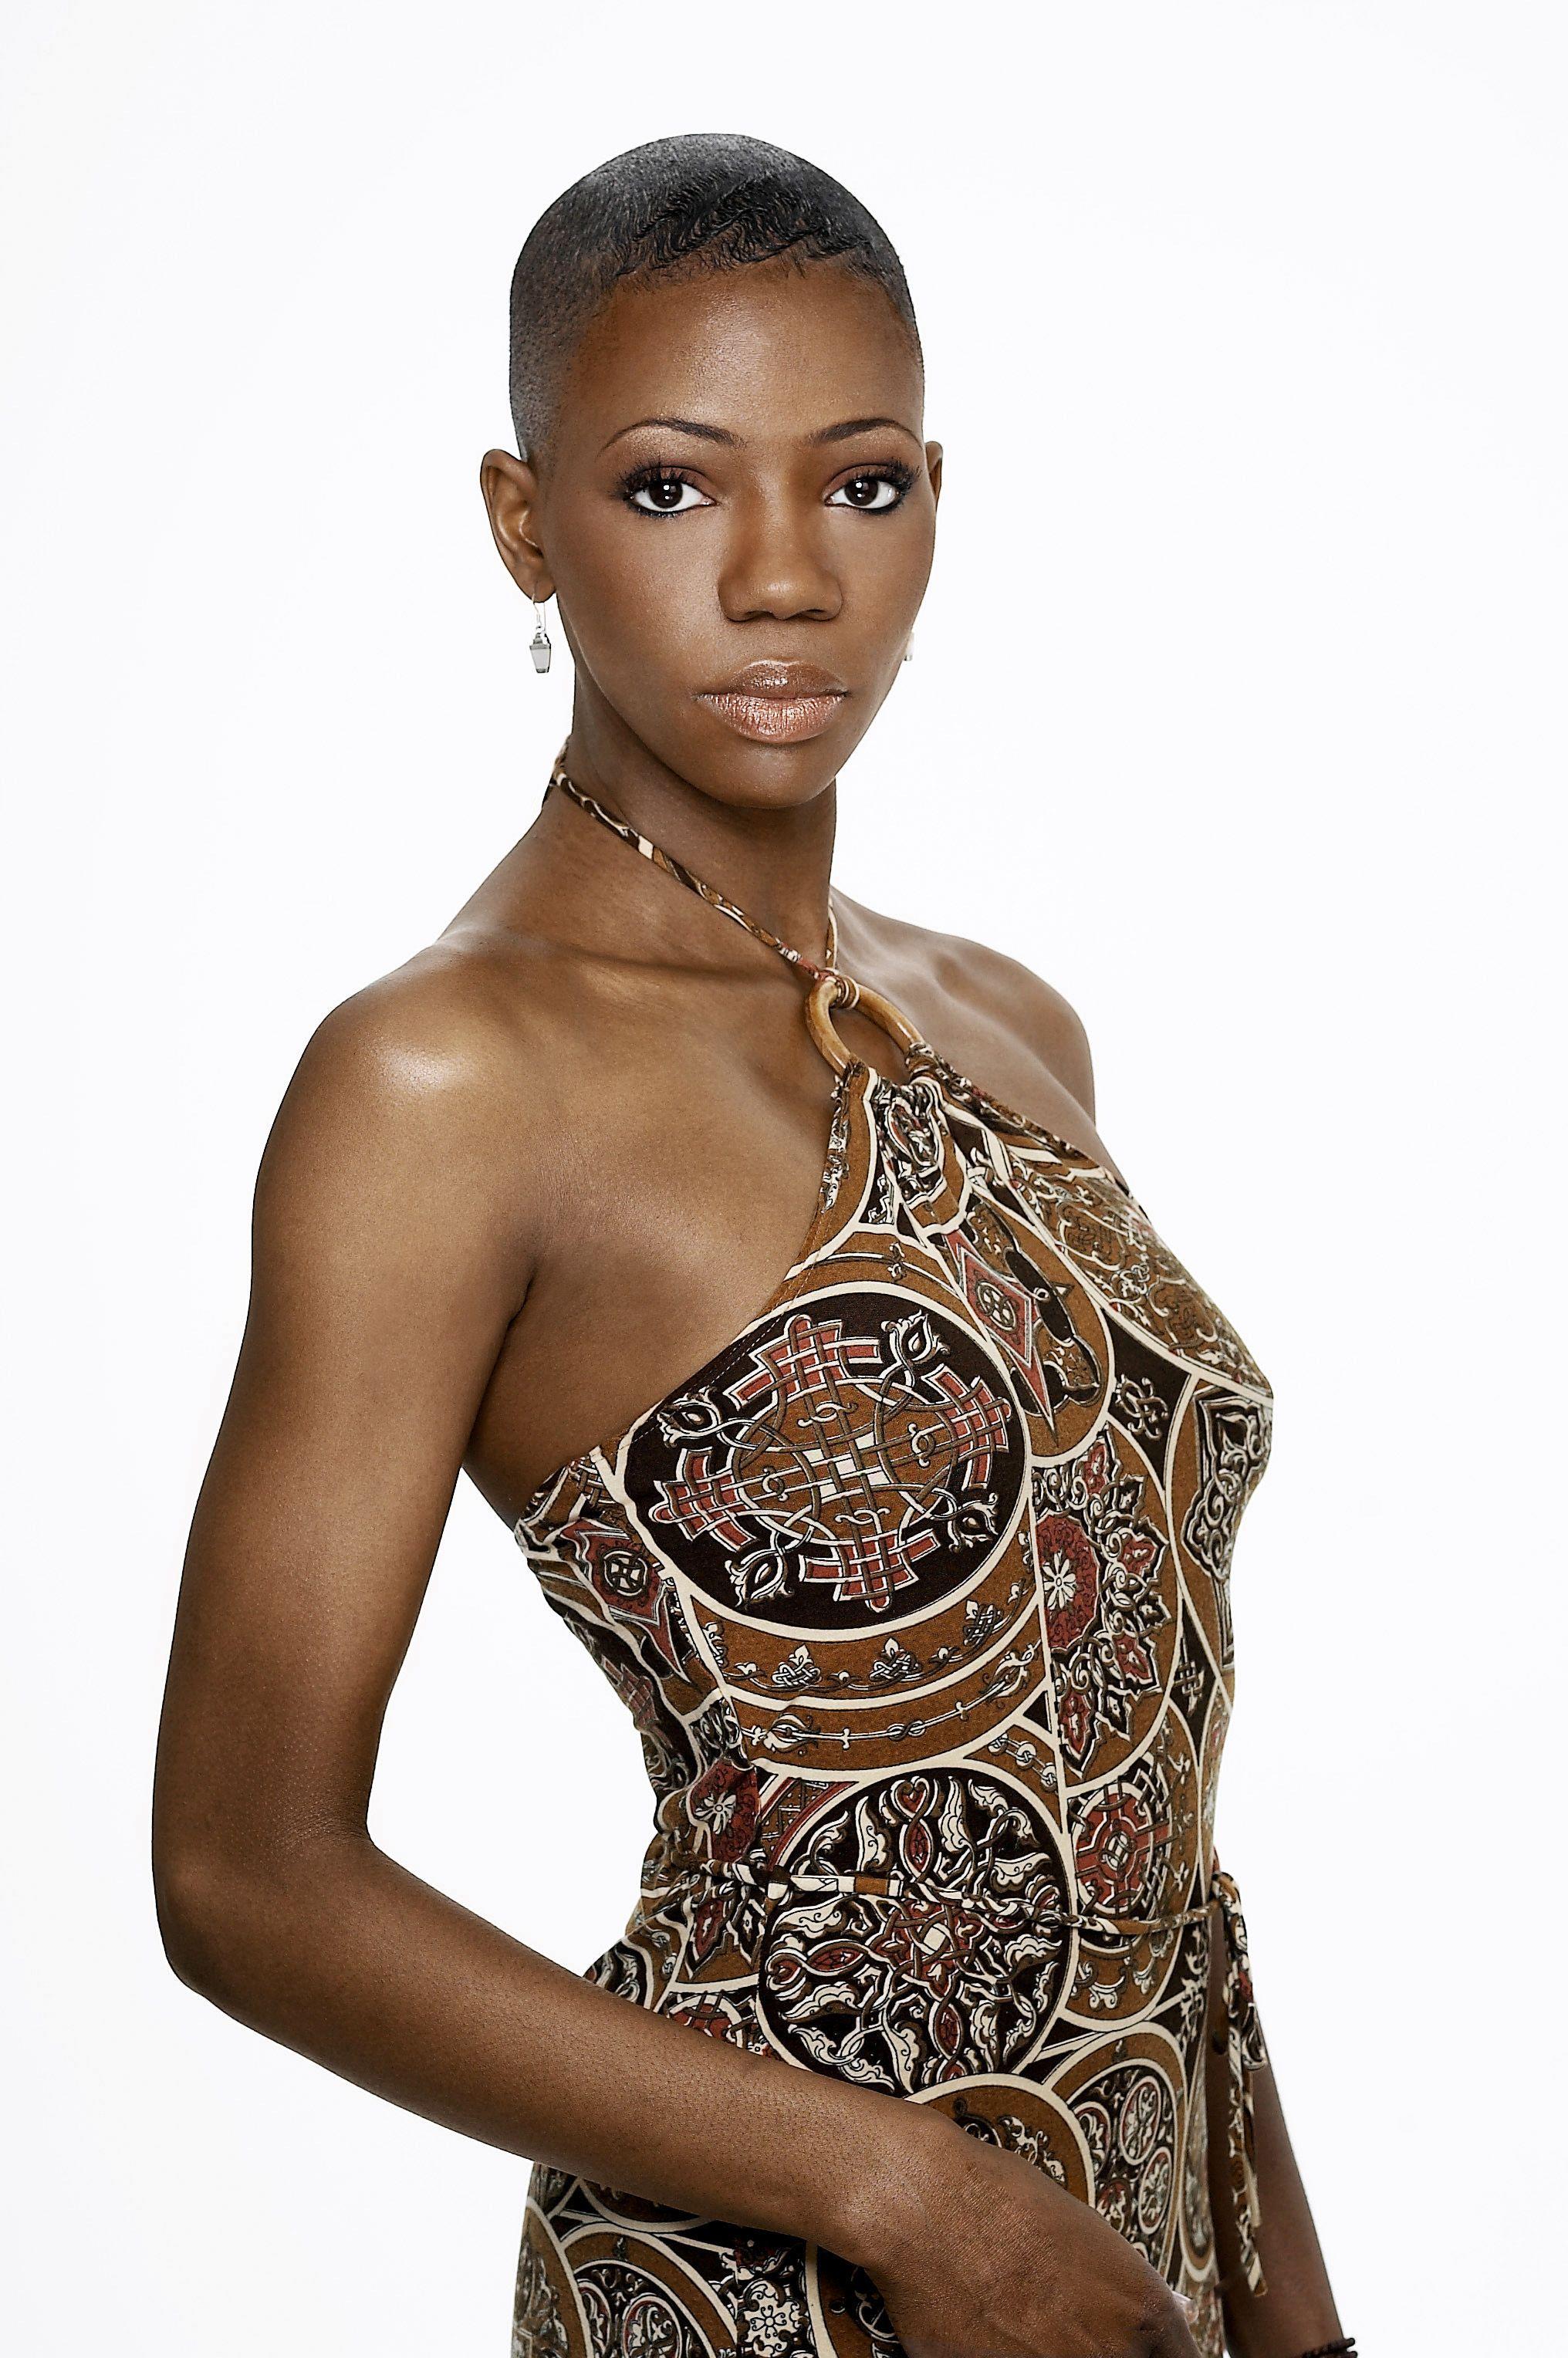 Ebony Haith Photo Casting, Americas Next Top Model, ANTM